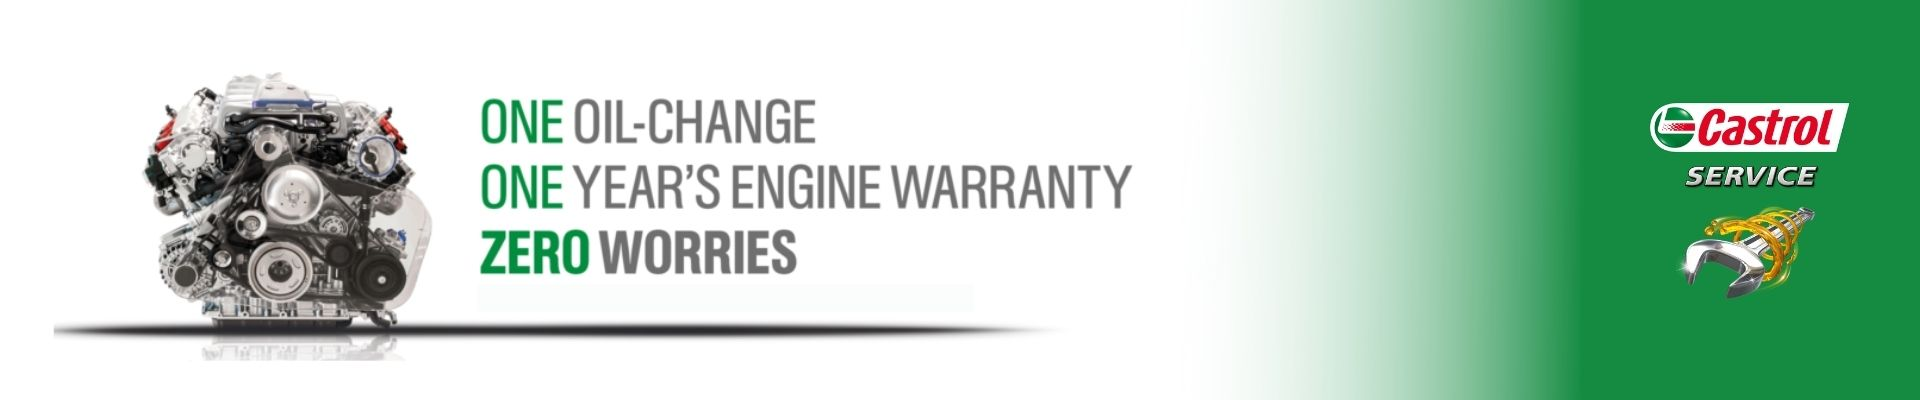 Castrol engine warranty banner